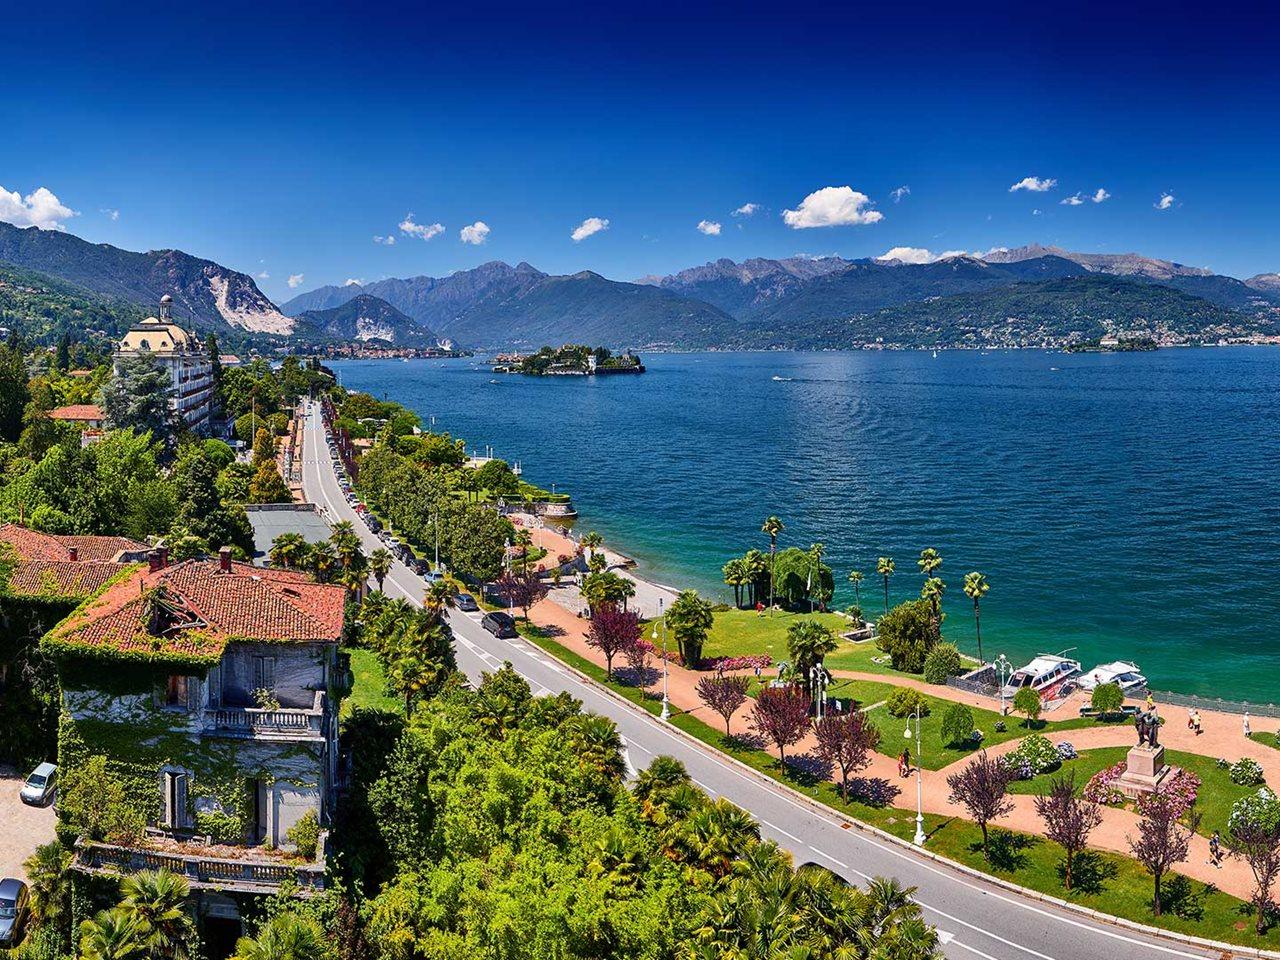 Excursiereis 10 dagen Italiaanse meren: Lago Maggiore, Orta en L